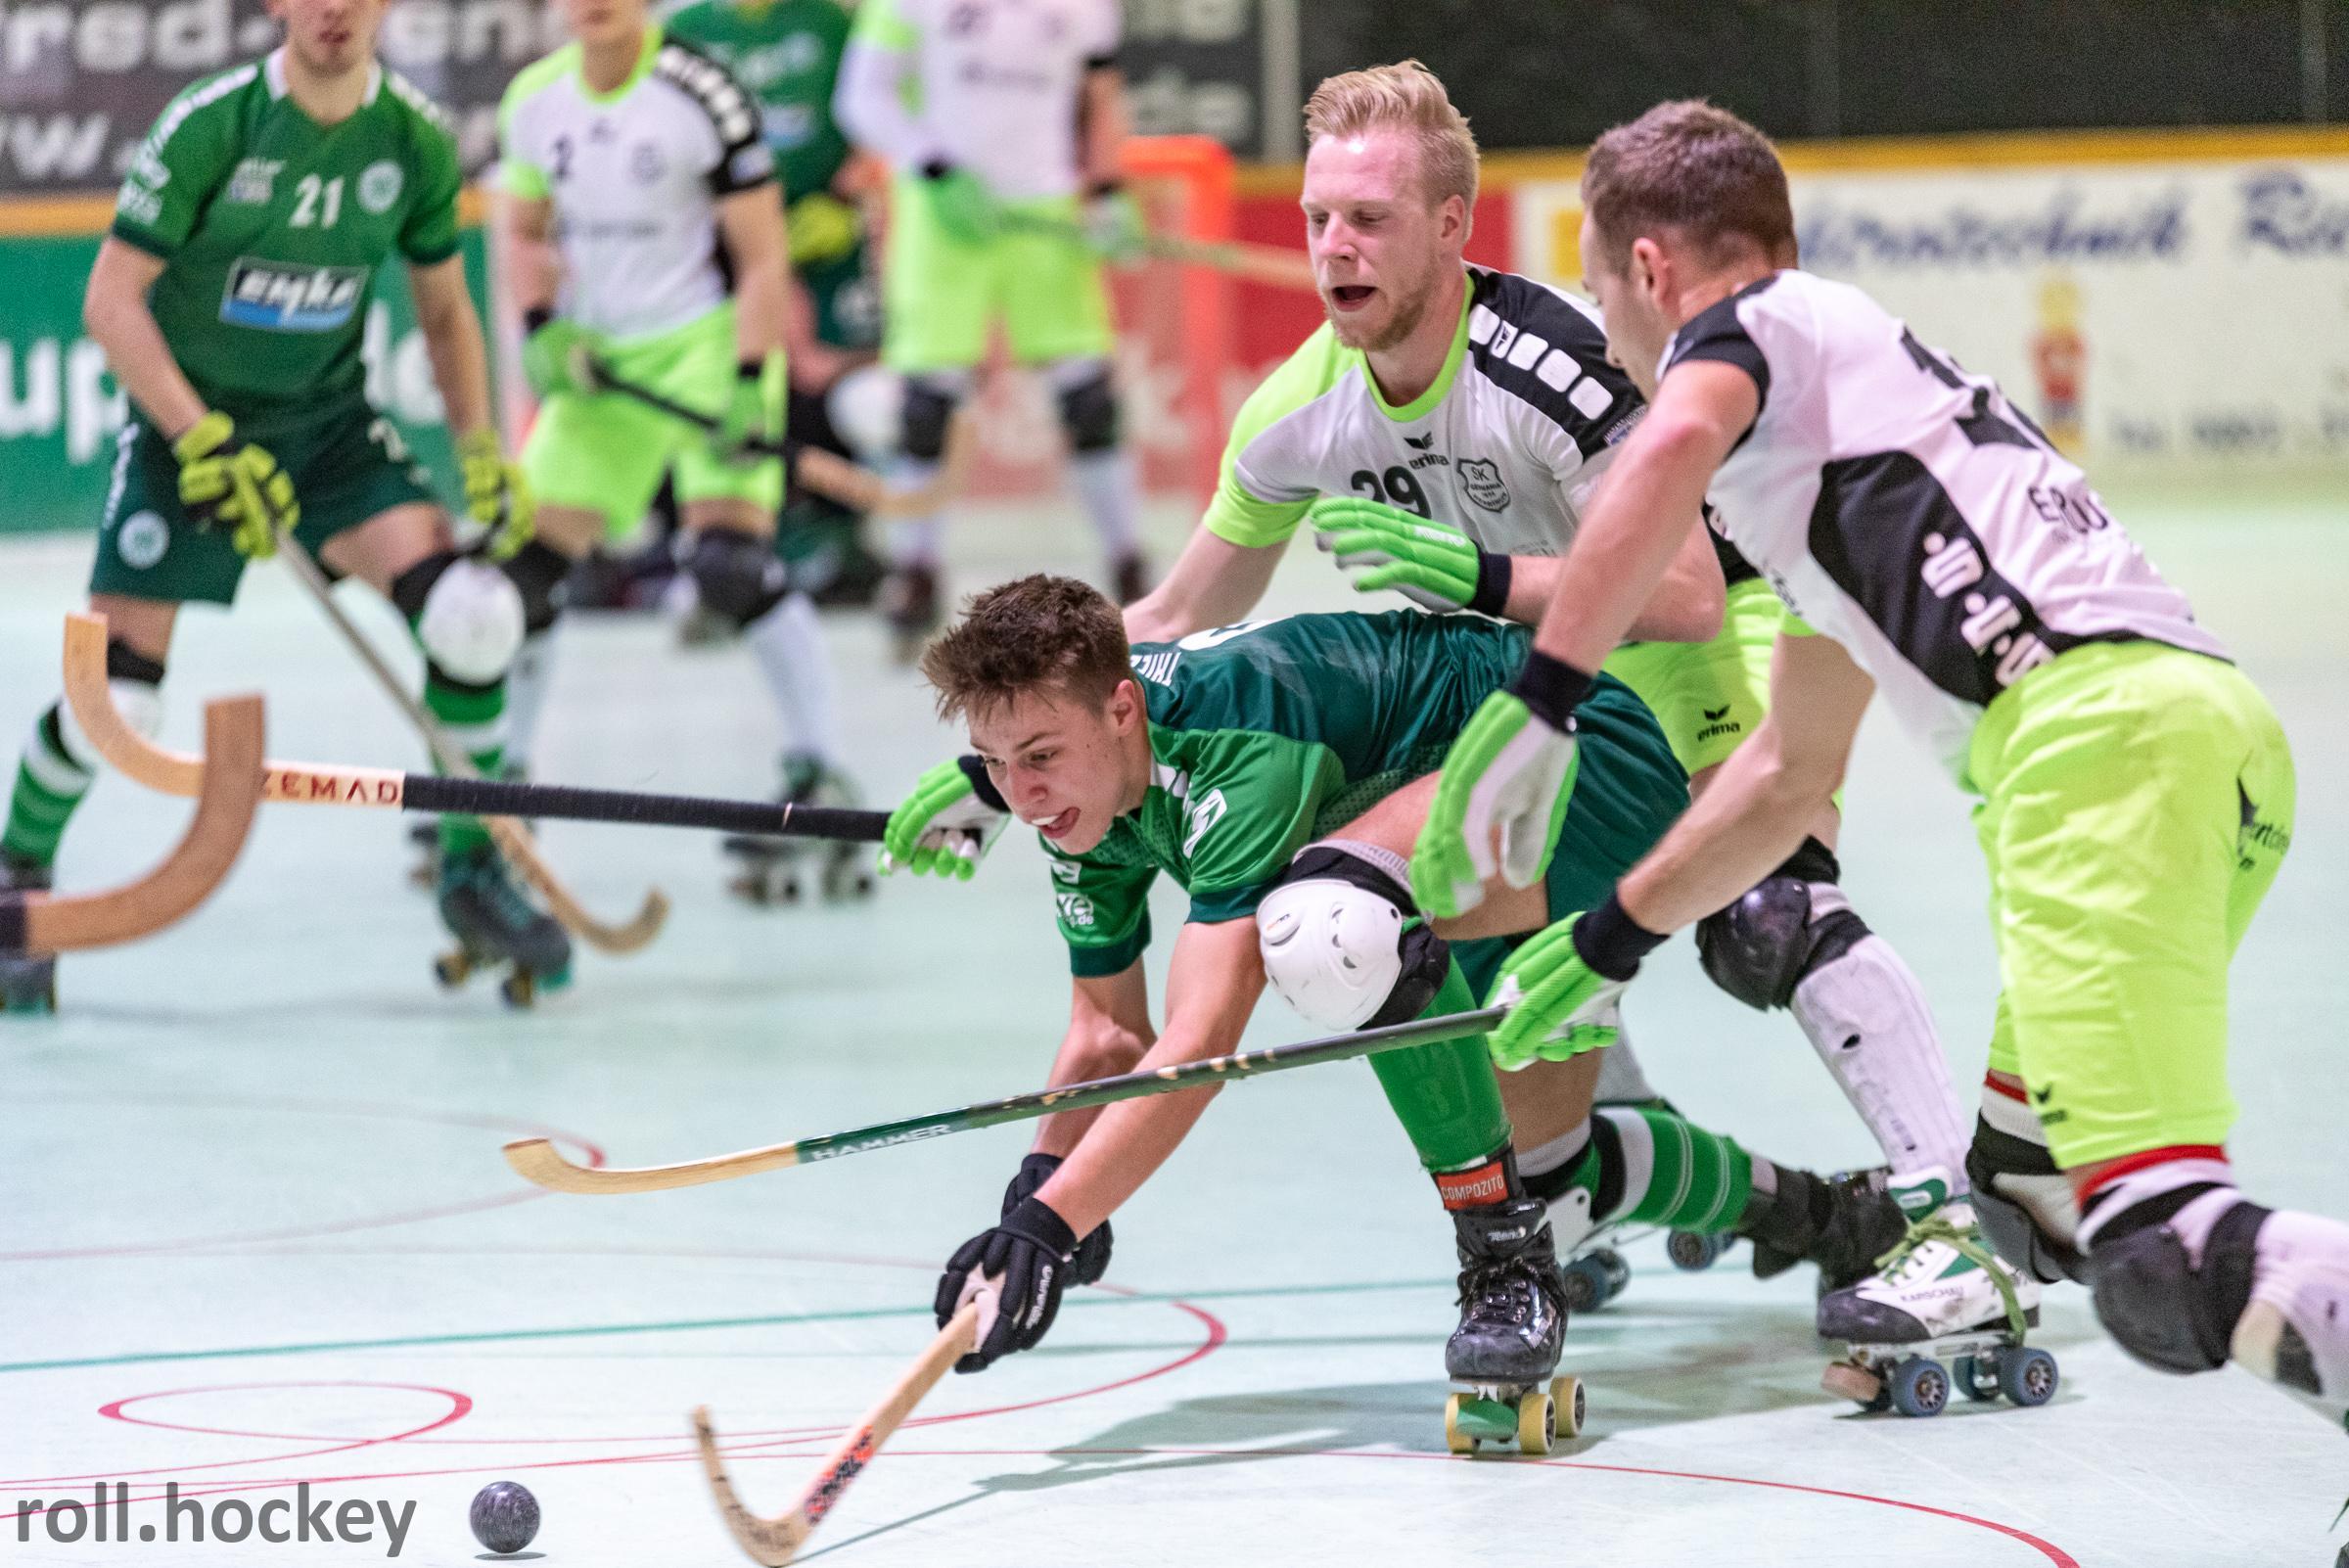 RSC Cronenberg Rollhockey DRIV-Pokal Viertelfinale Herren 14.03.2019